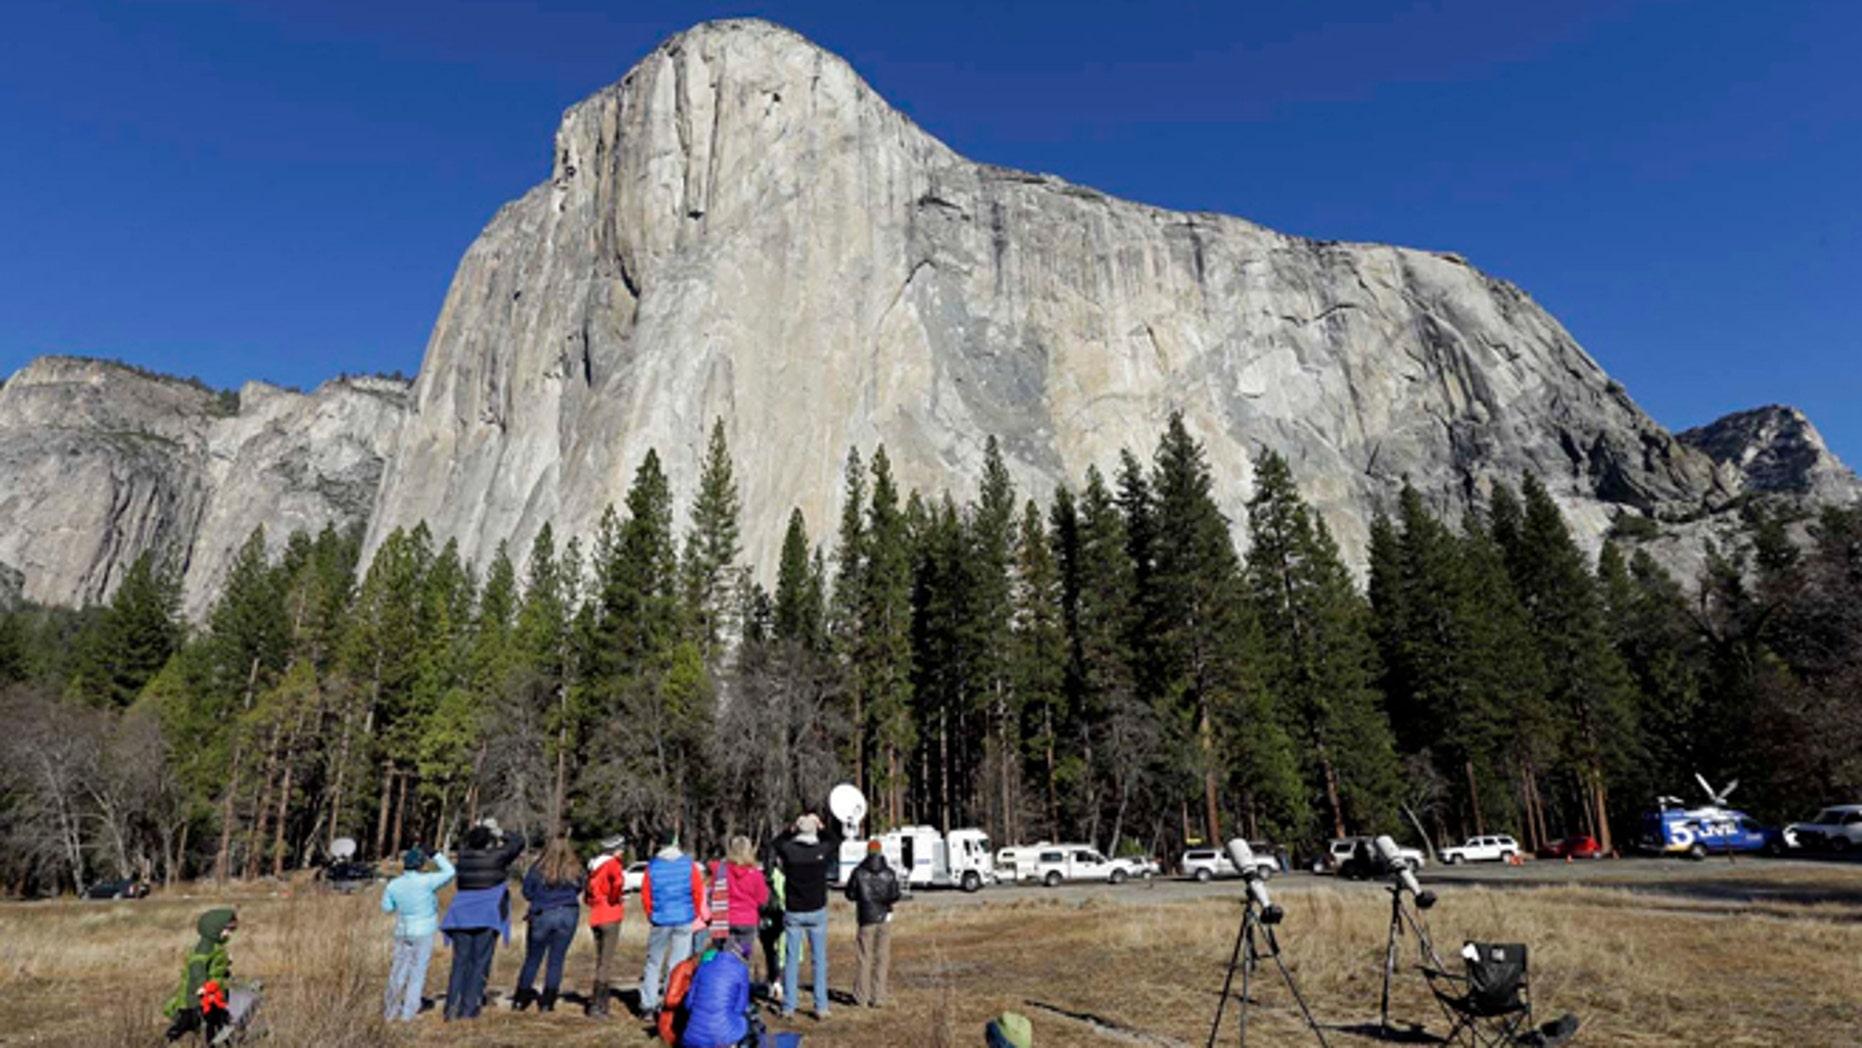 Jan. 14, 2015: Spectators gaze at El Capitan, as seen from the valley floor in Yosemite National Park, Calif.